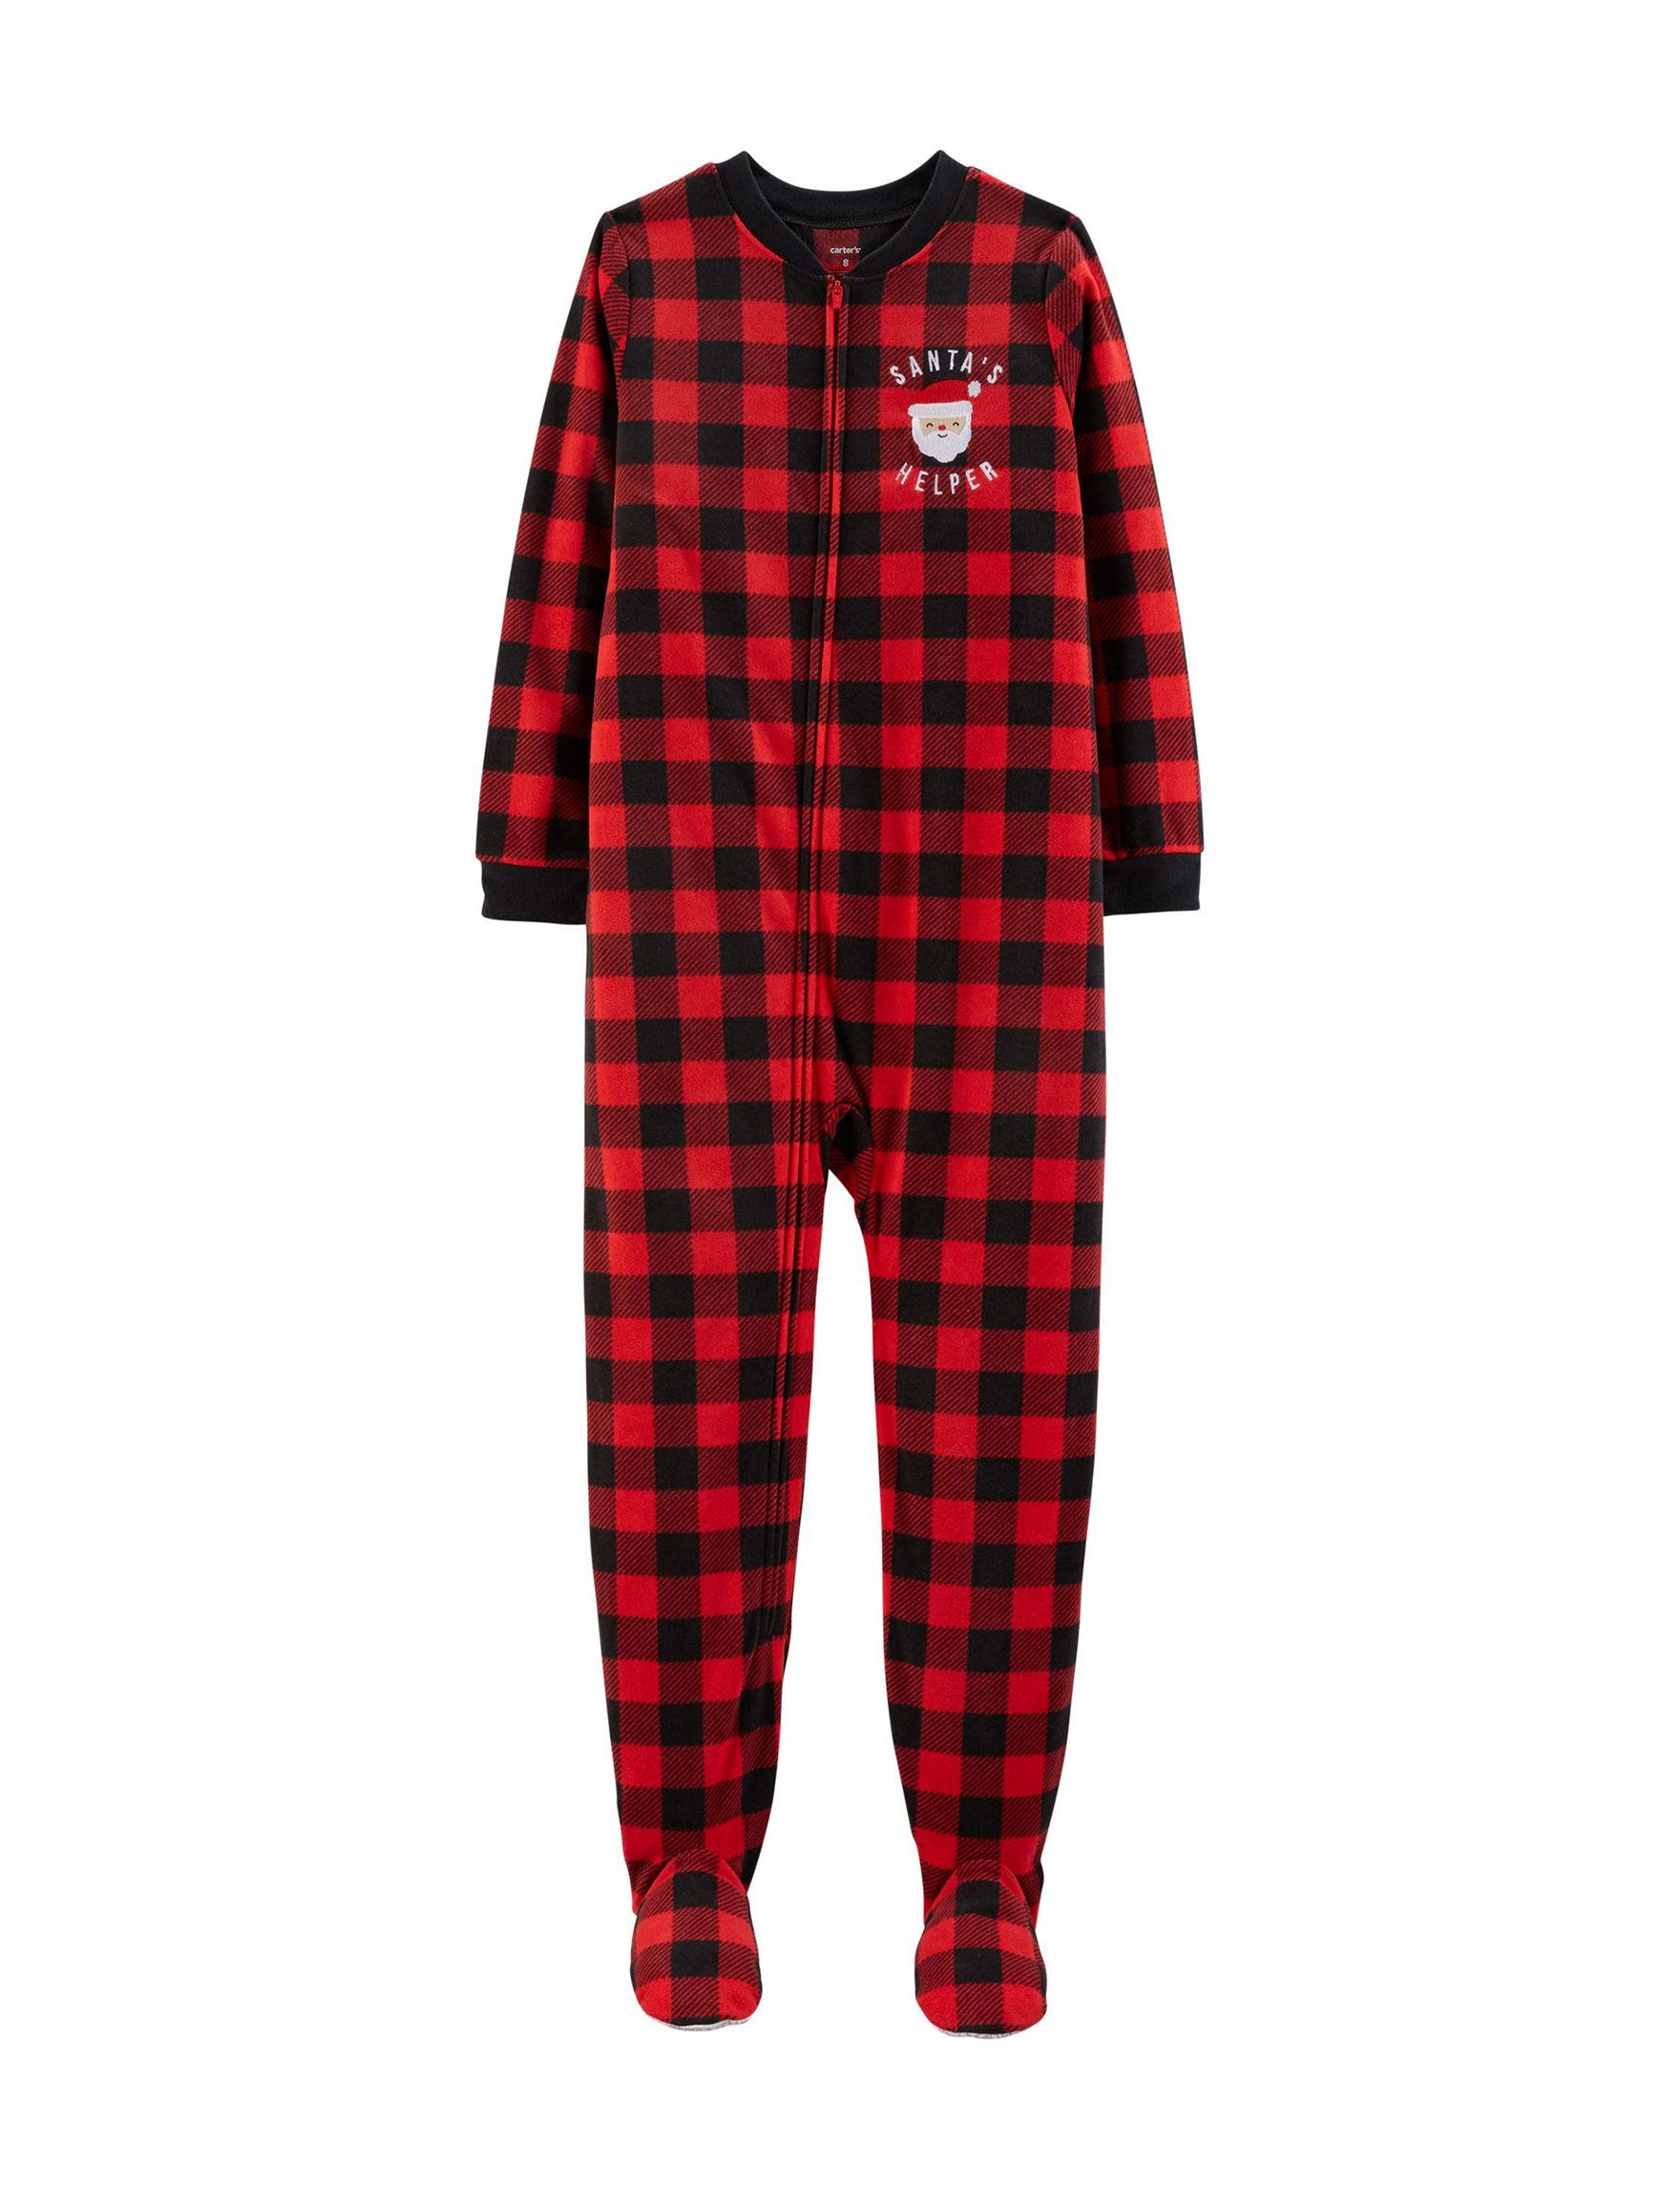 Carter's Red Plaid Pajama Sets